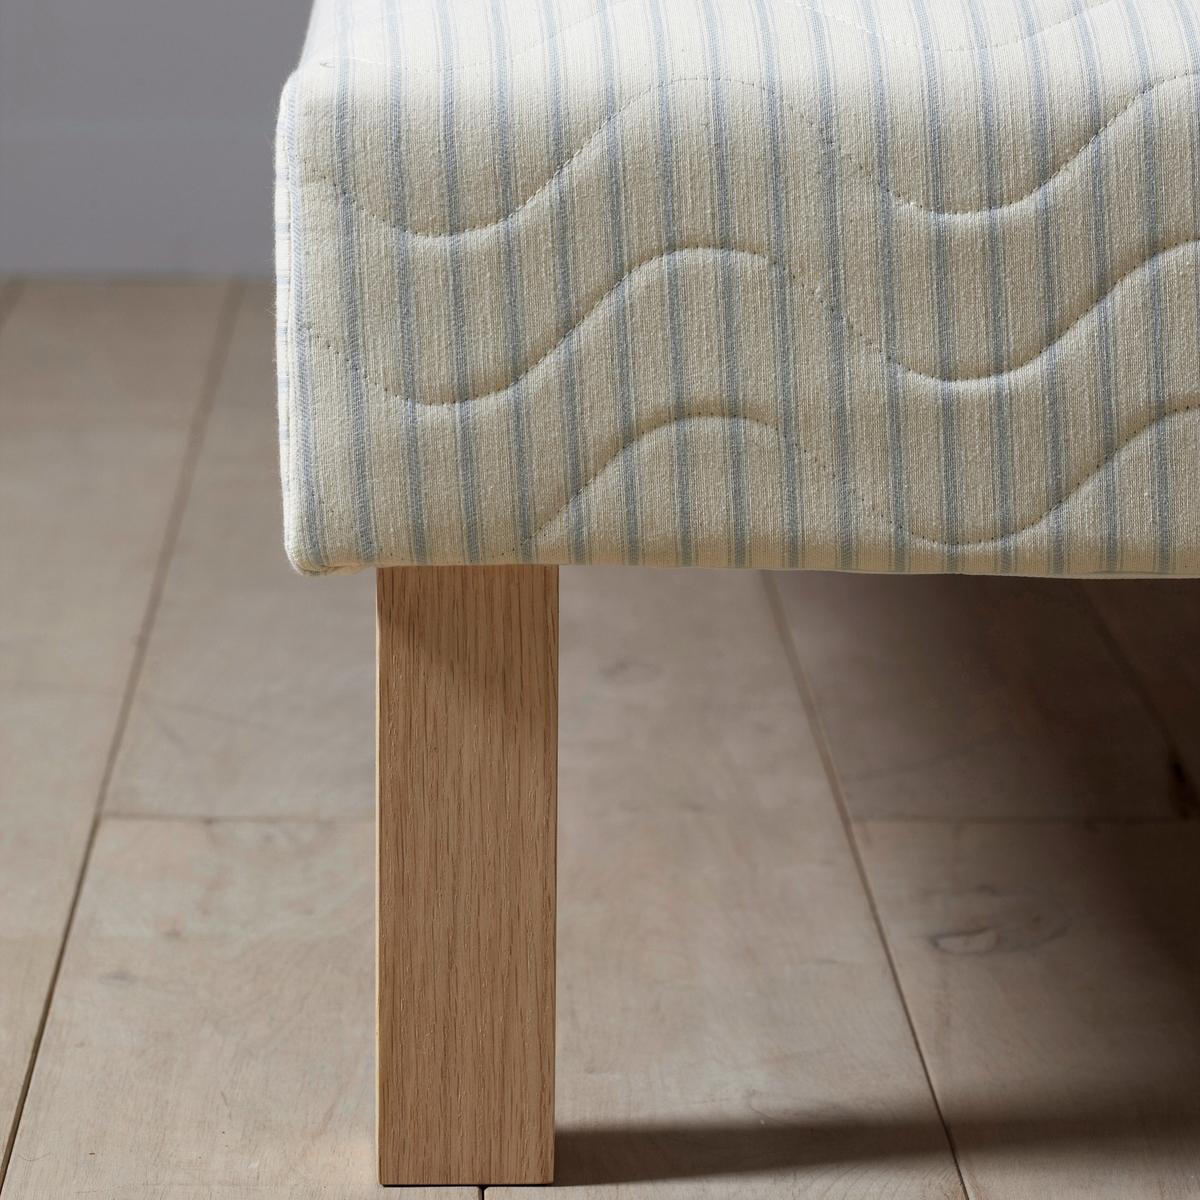 4 ножки для кровати из дуба, Gérémi от La Redoute